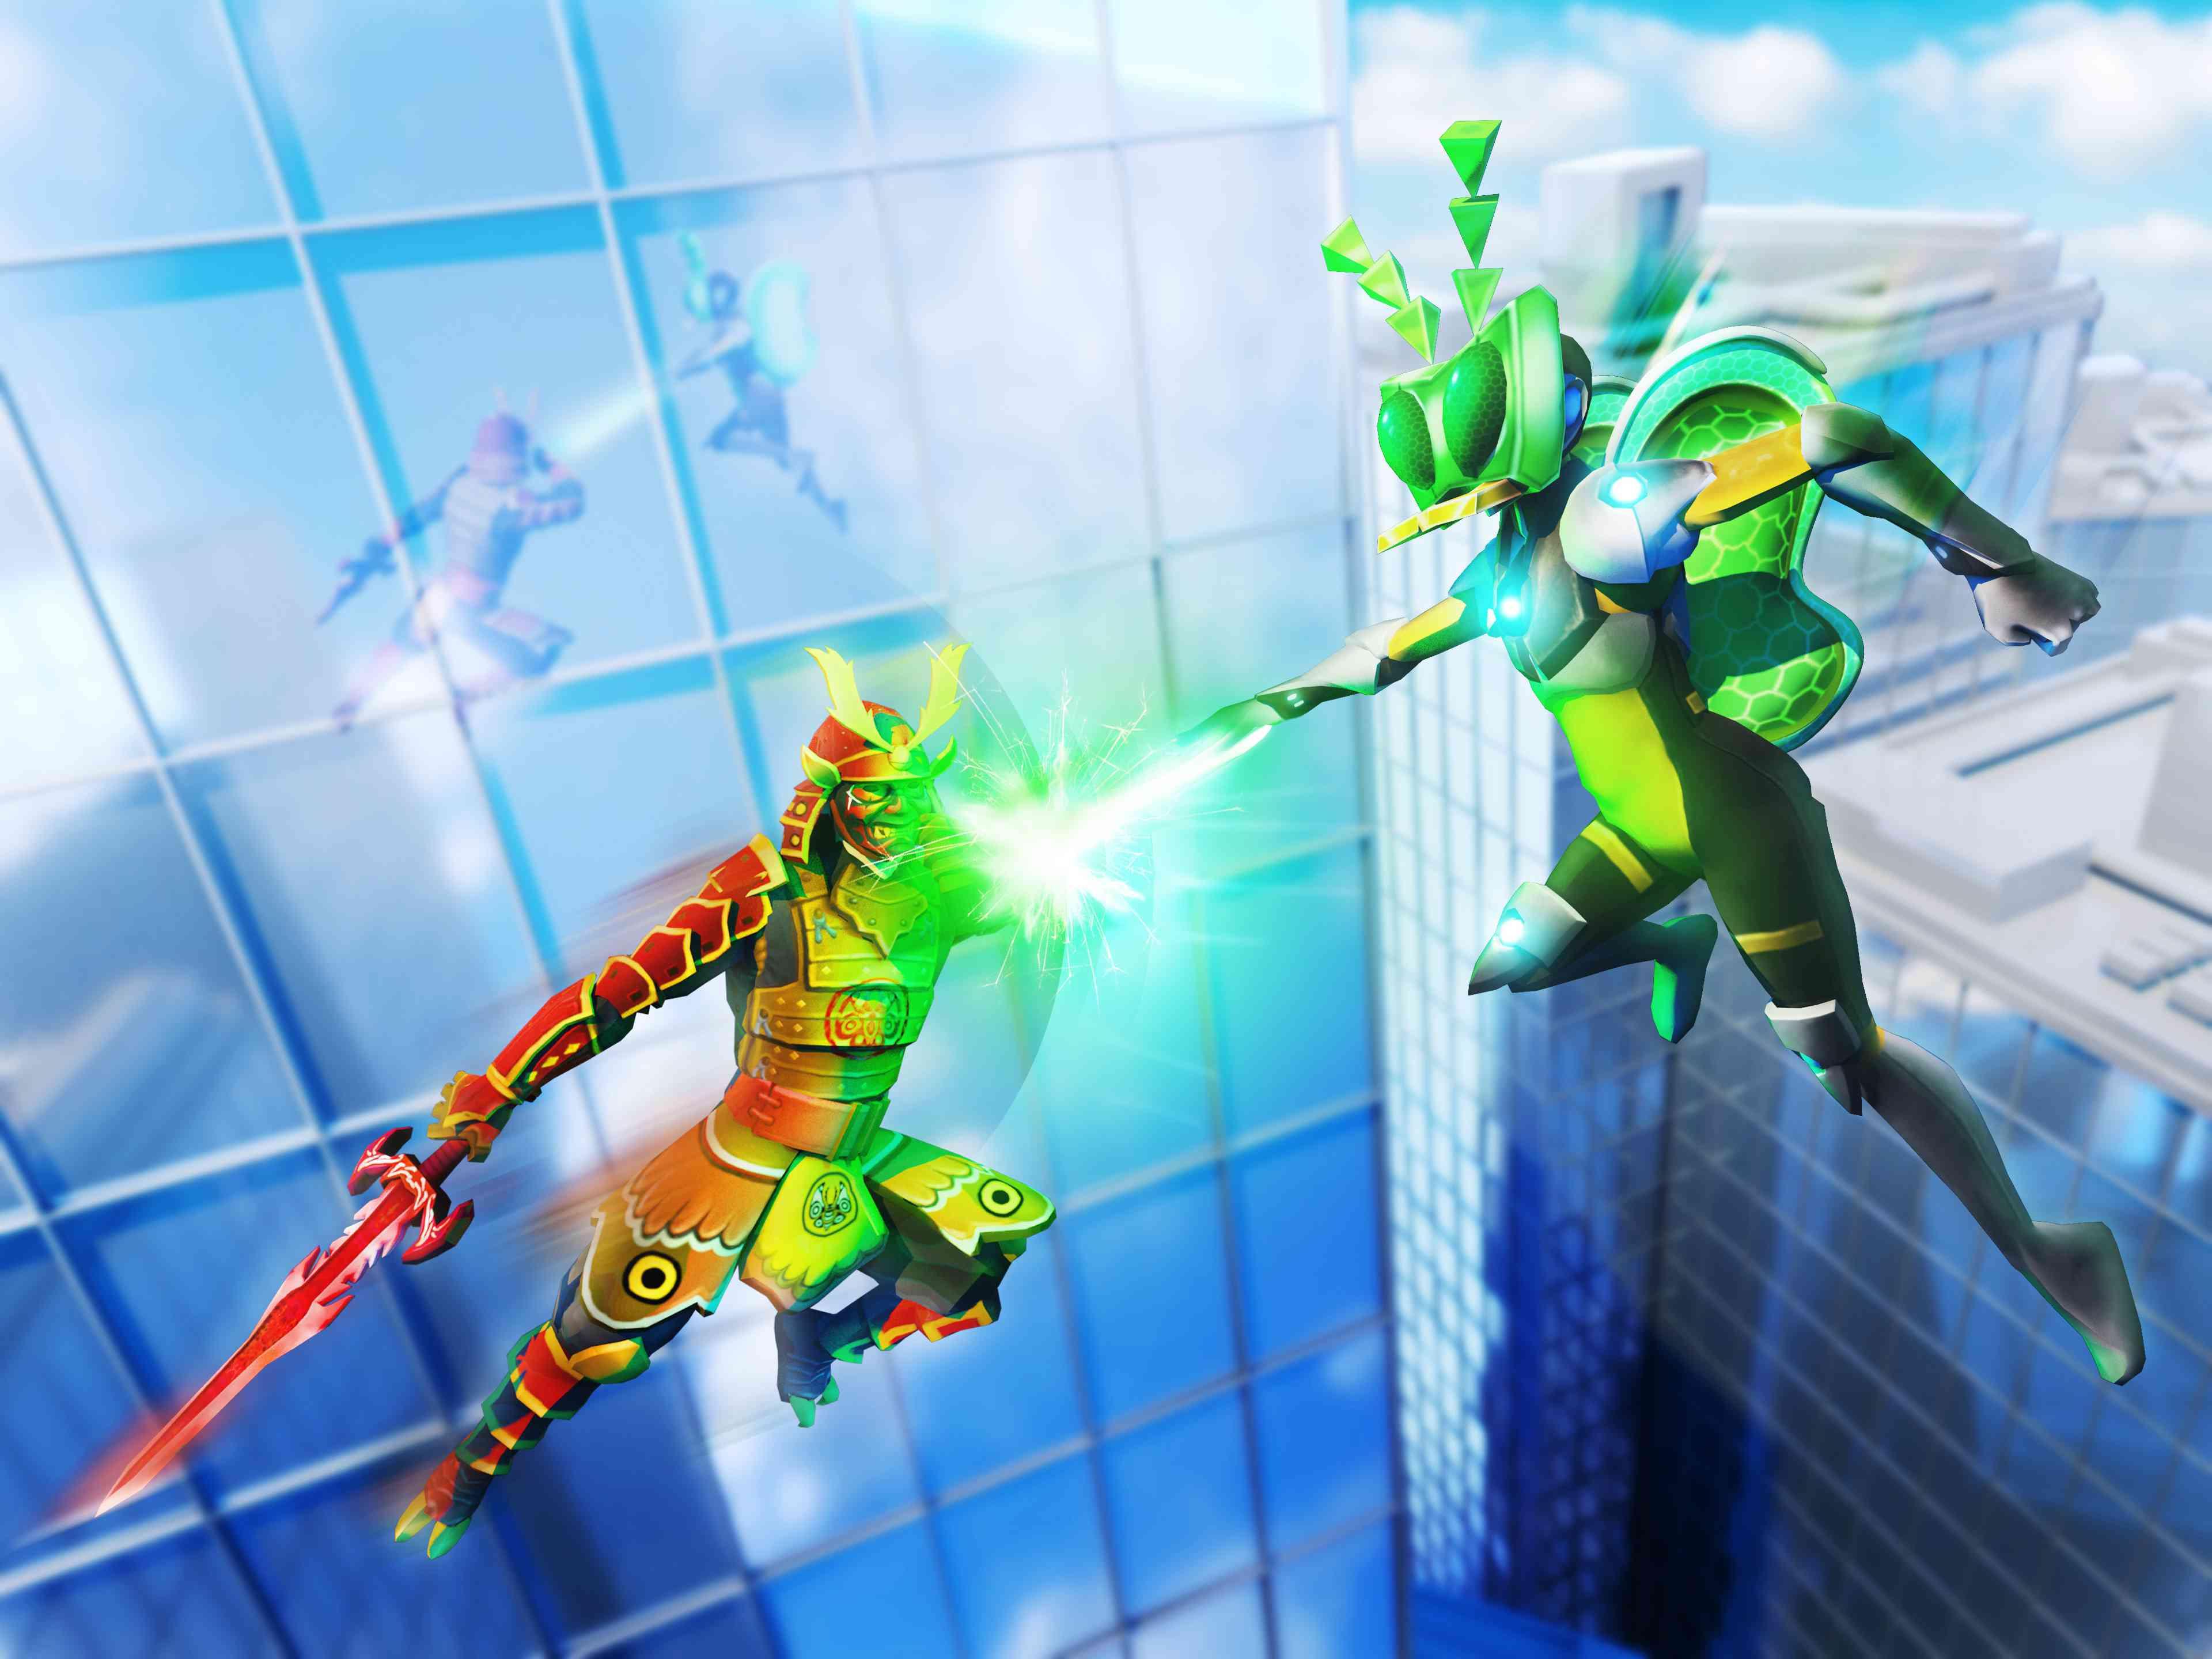 Roblox screenshot of two superheroes battling in the sky